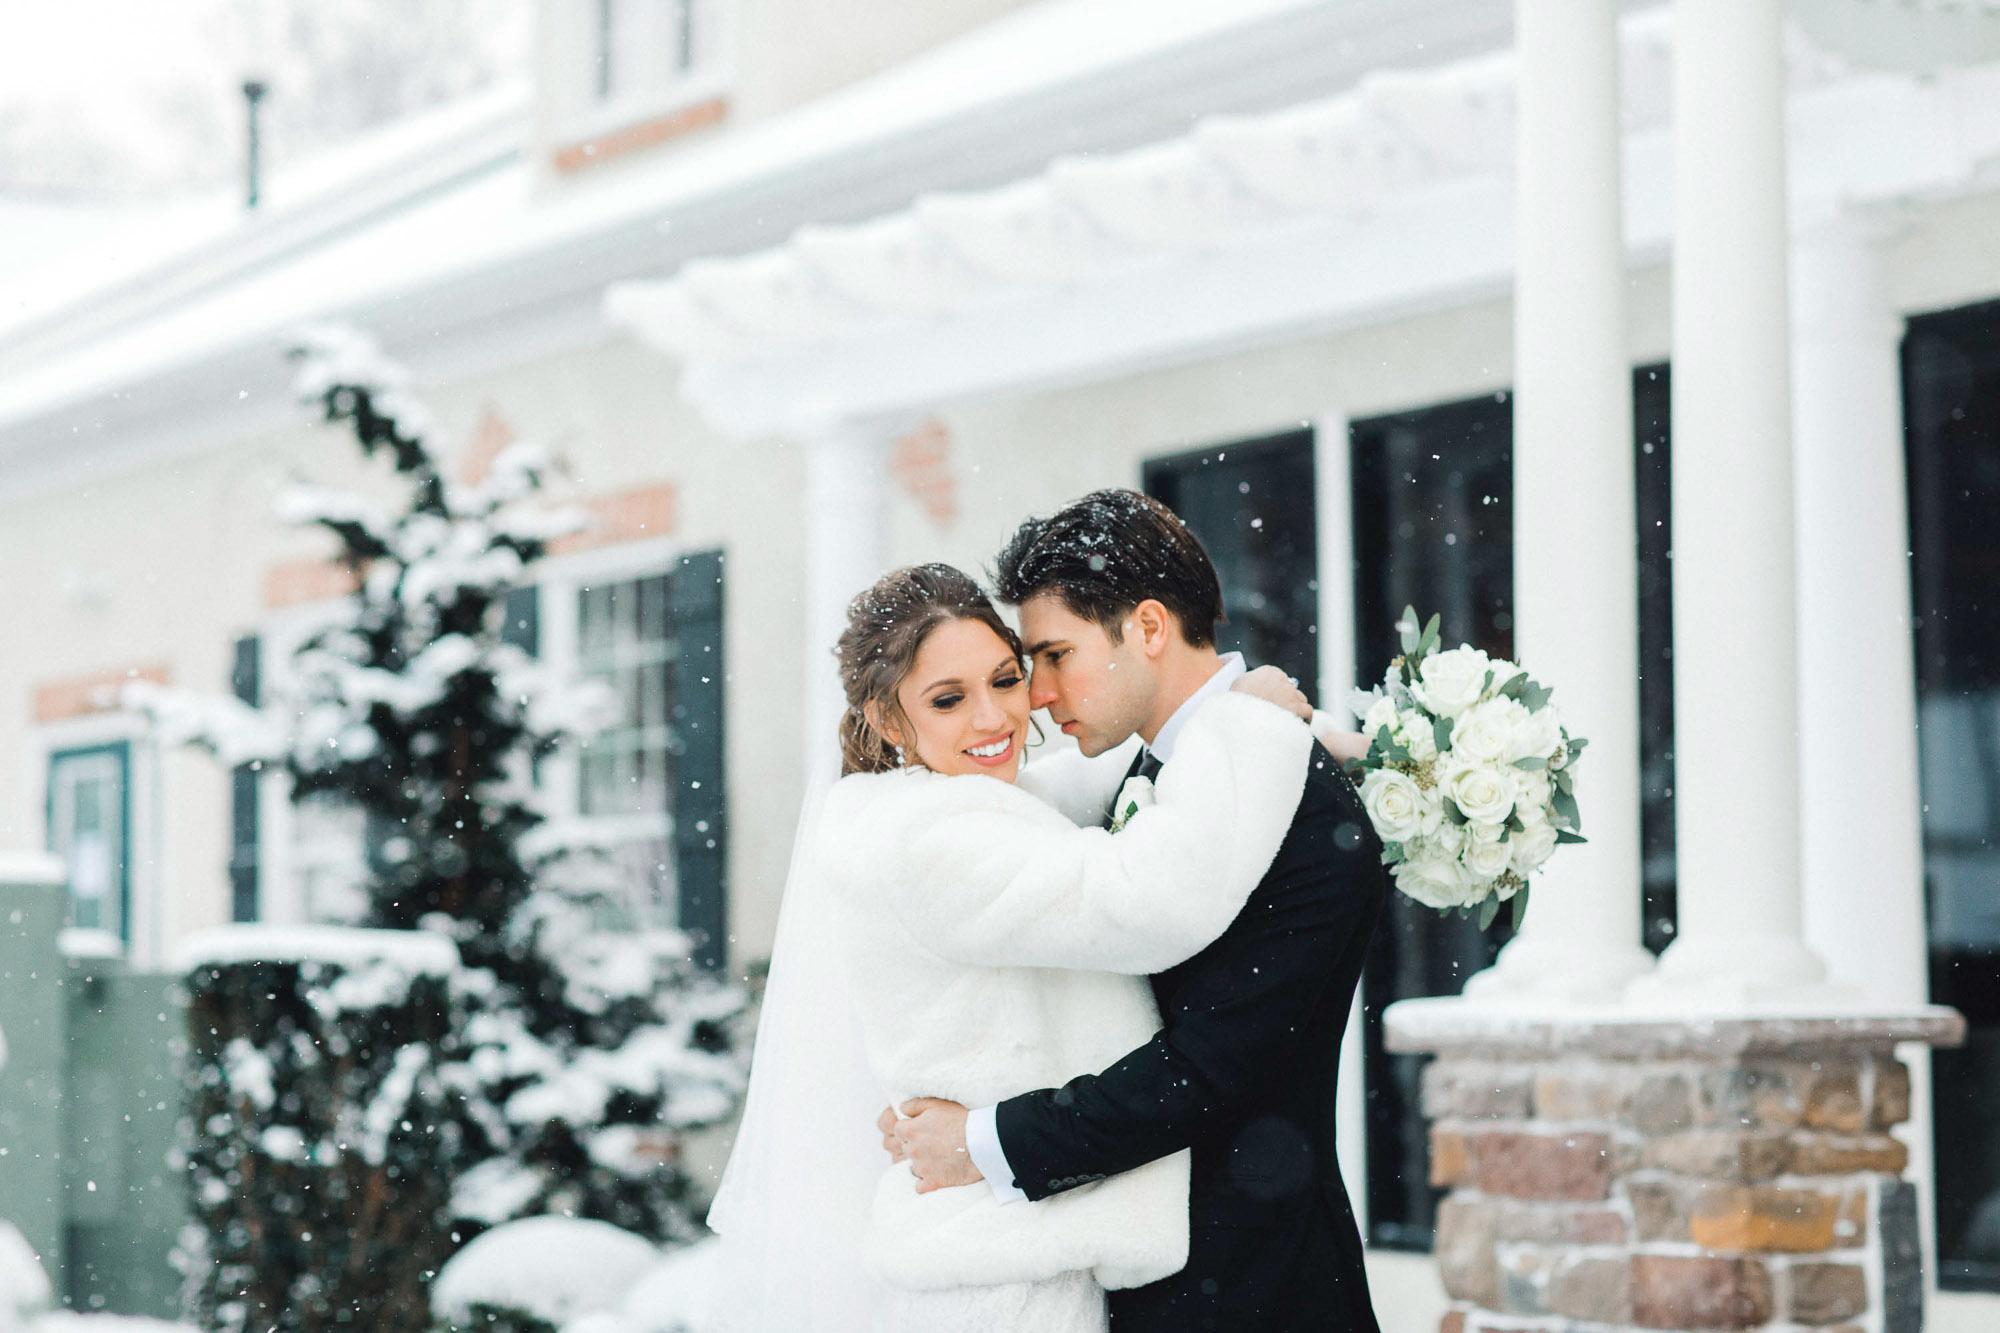 snowy-sand-springs-country-club-drums-pa-christmas-wedding-24627.jpg